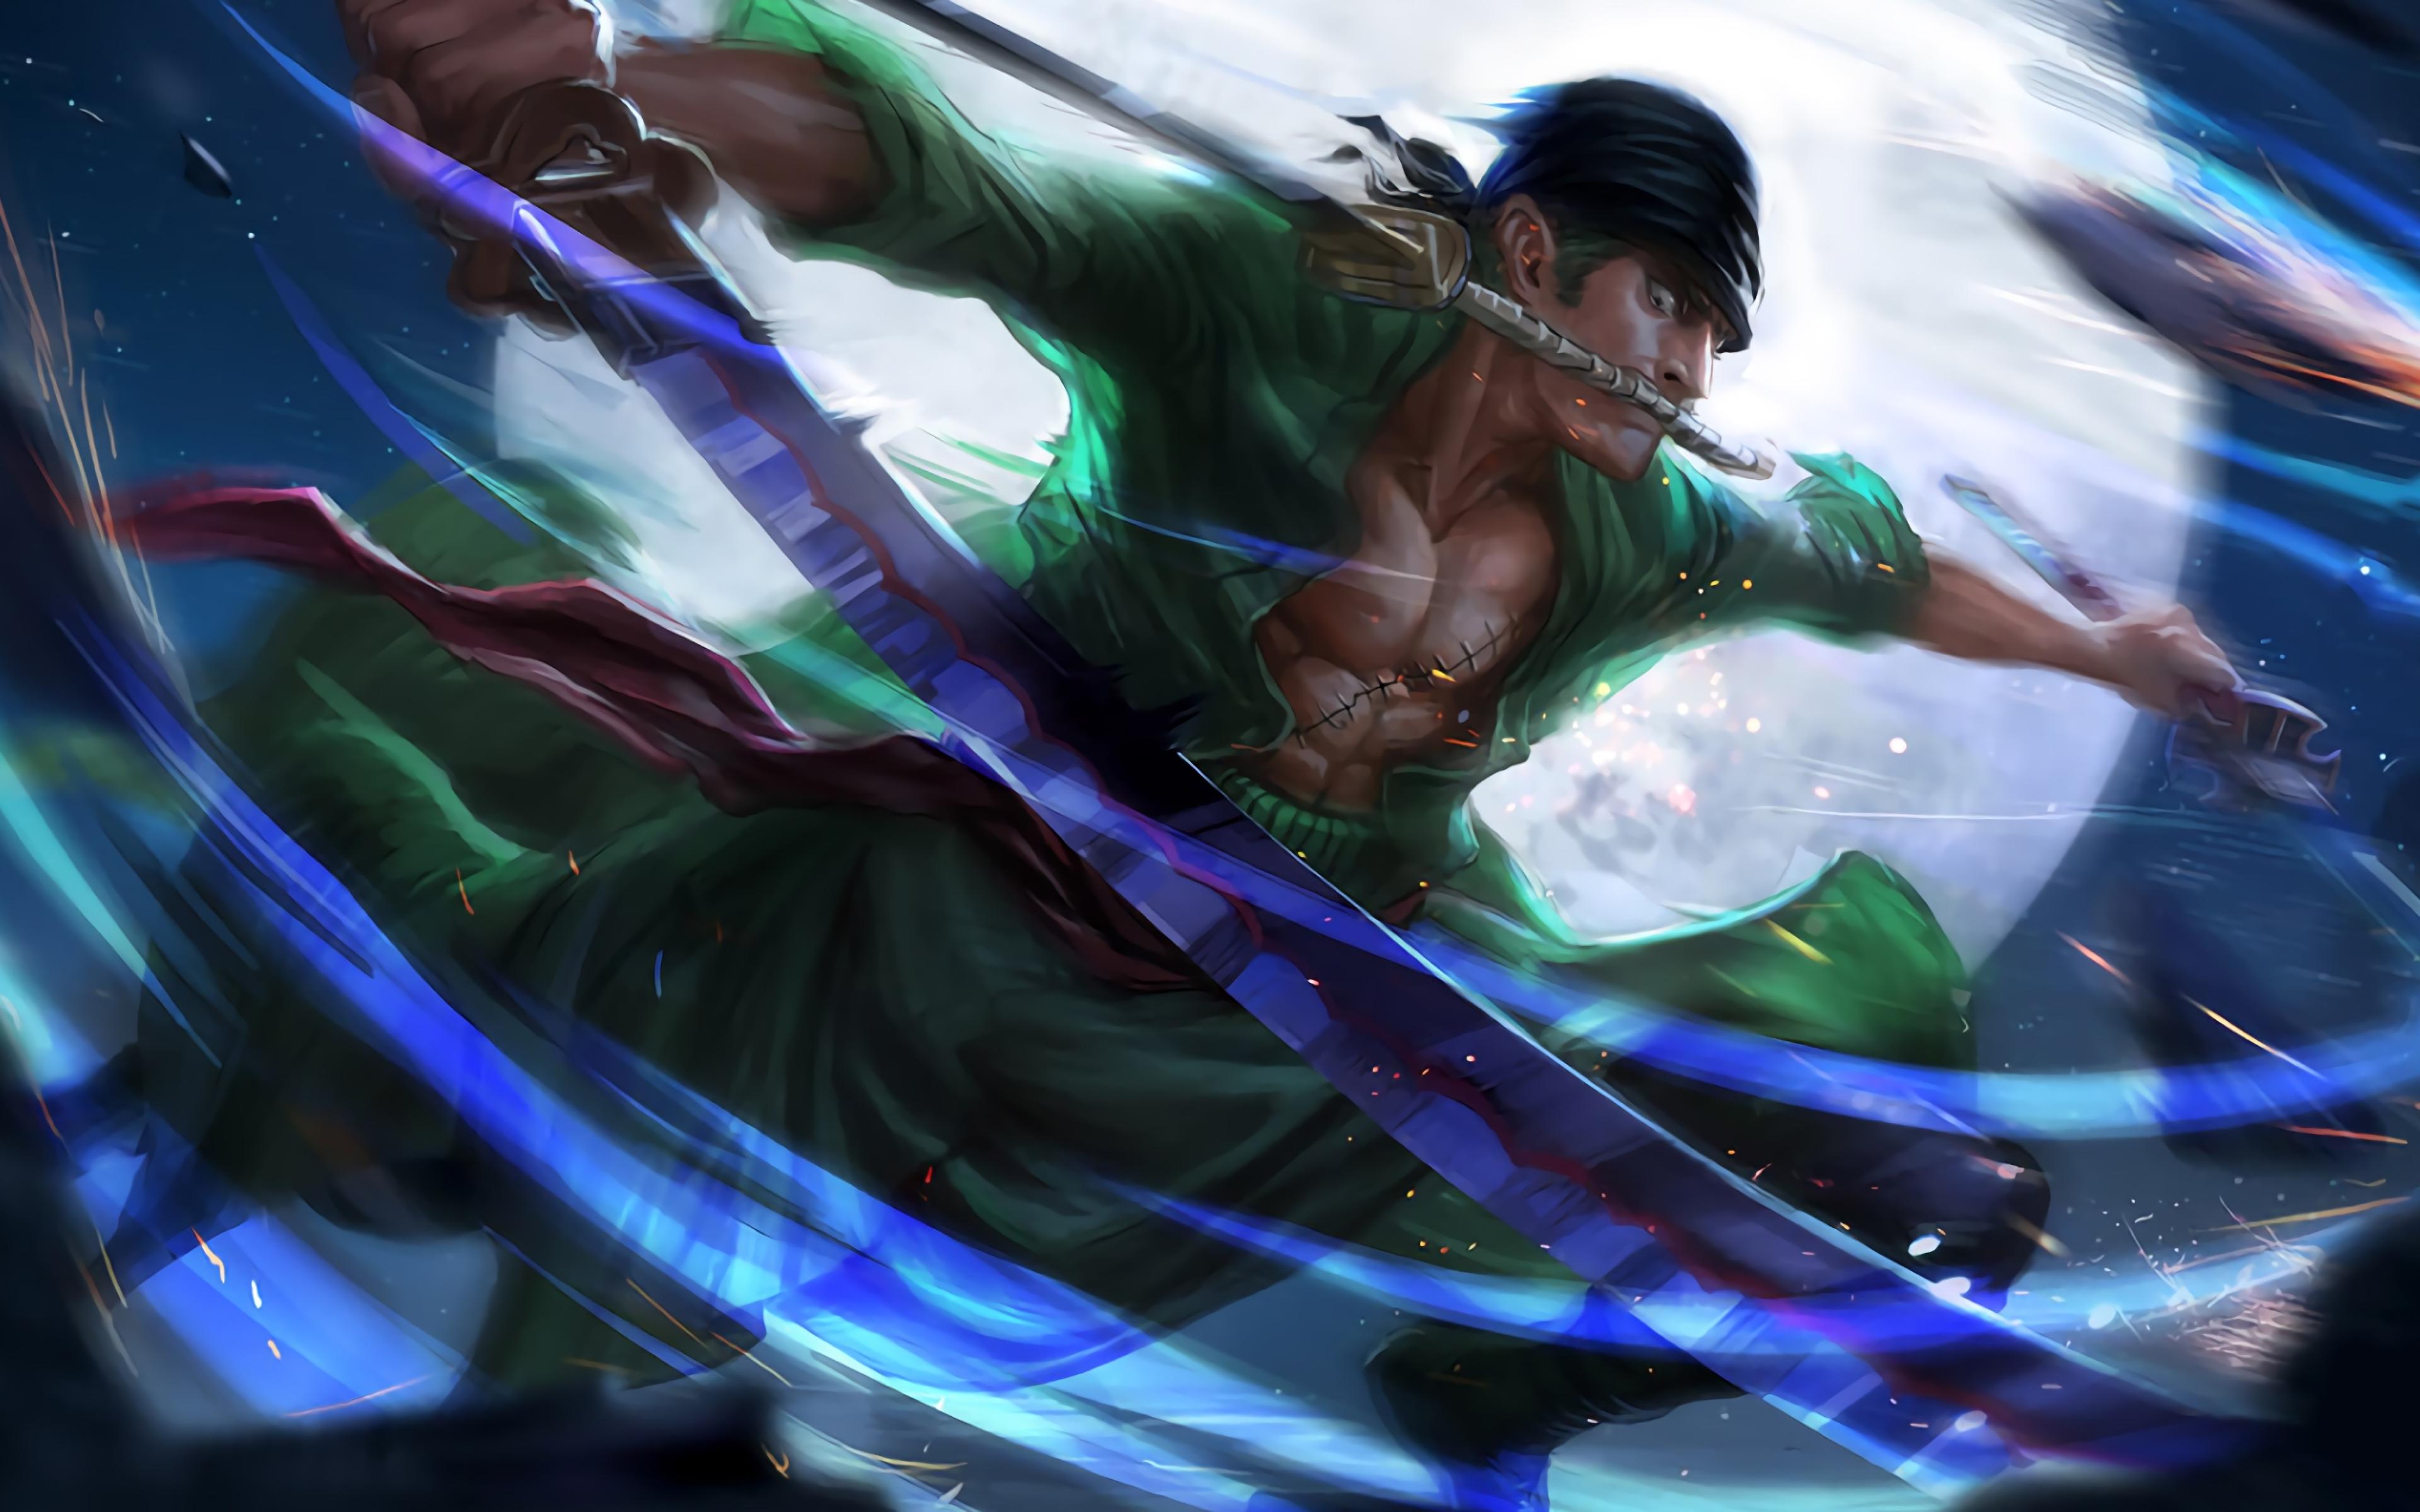 4k, Roronoa Zoro, Katana, Manga, Darkness, One Piece - One Piece Wallpaper 4k - HD Wallpaper